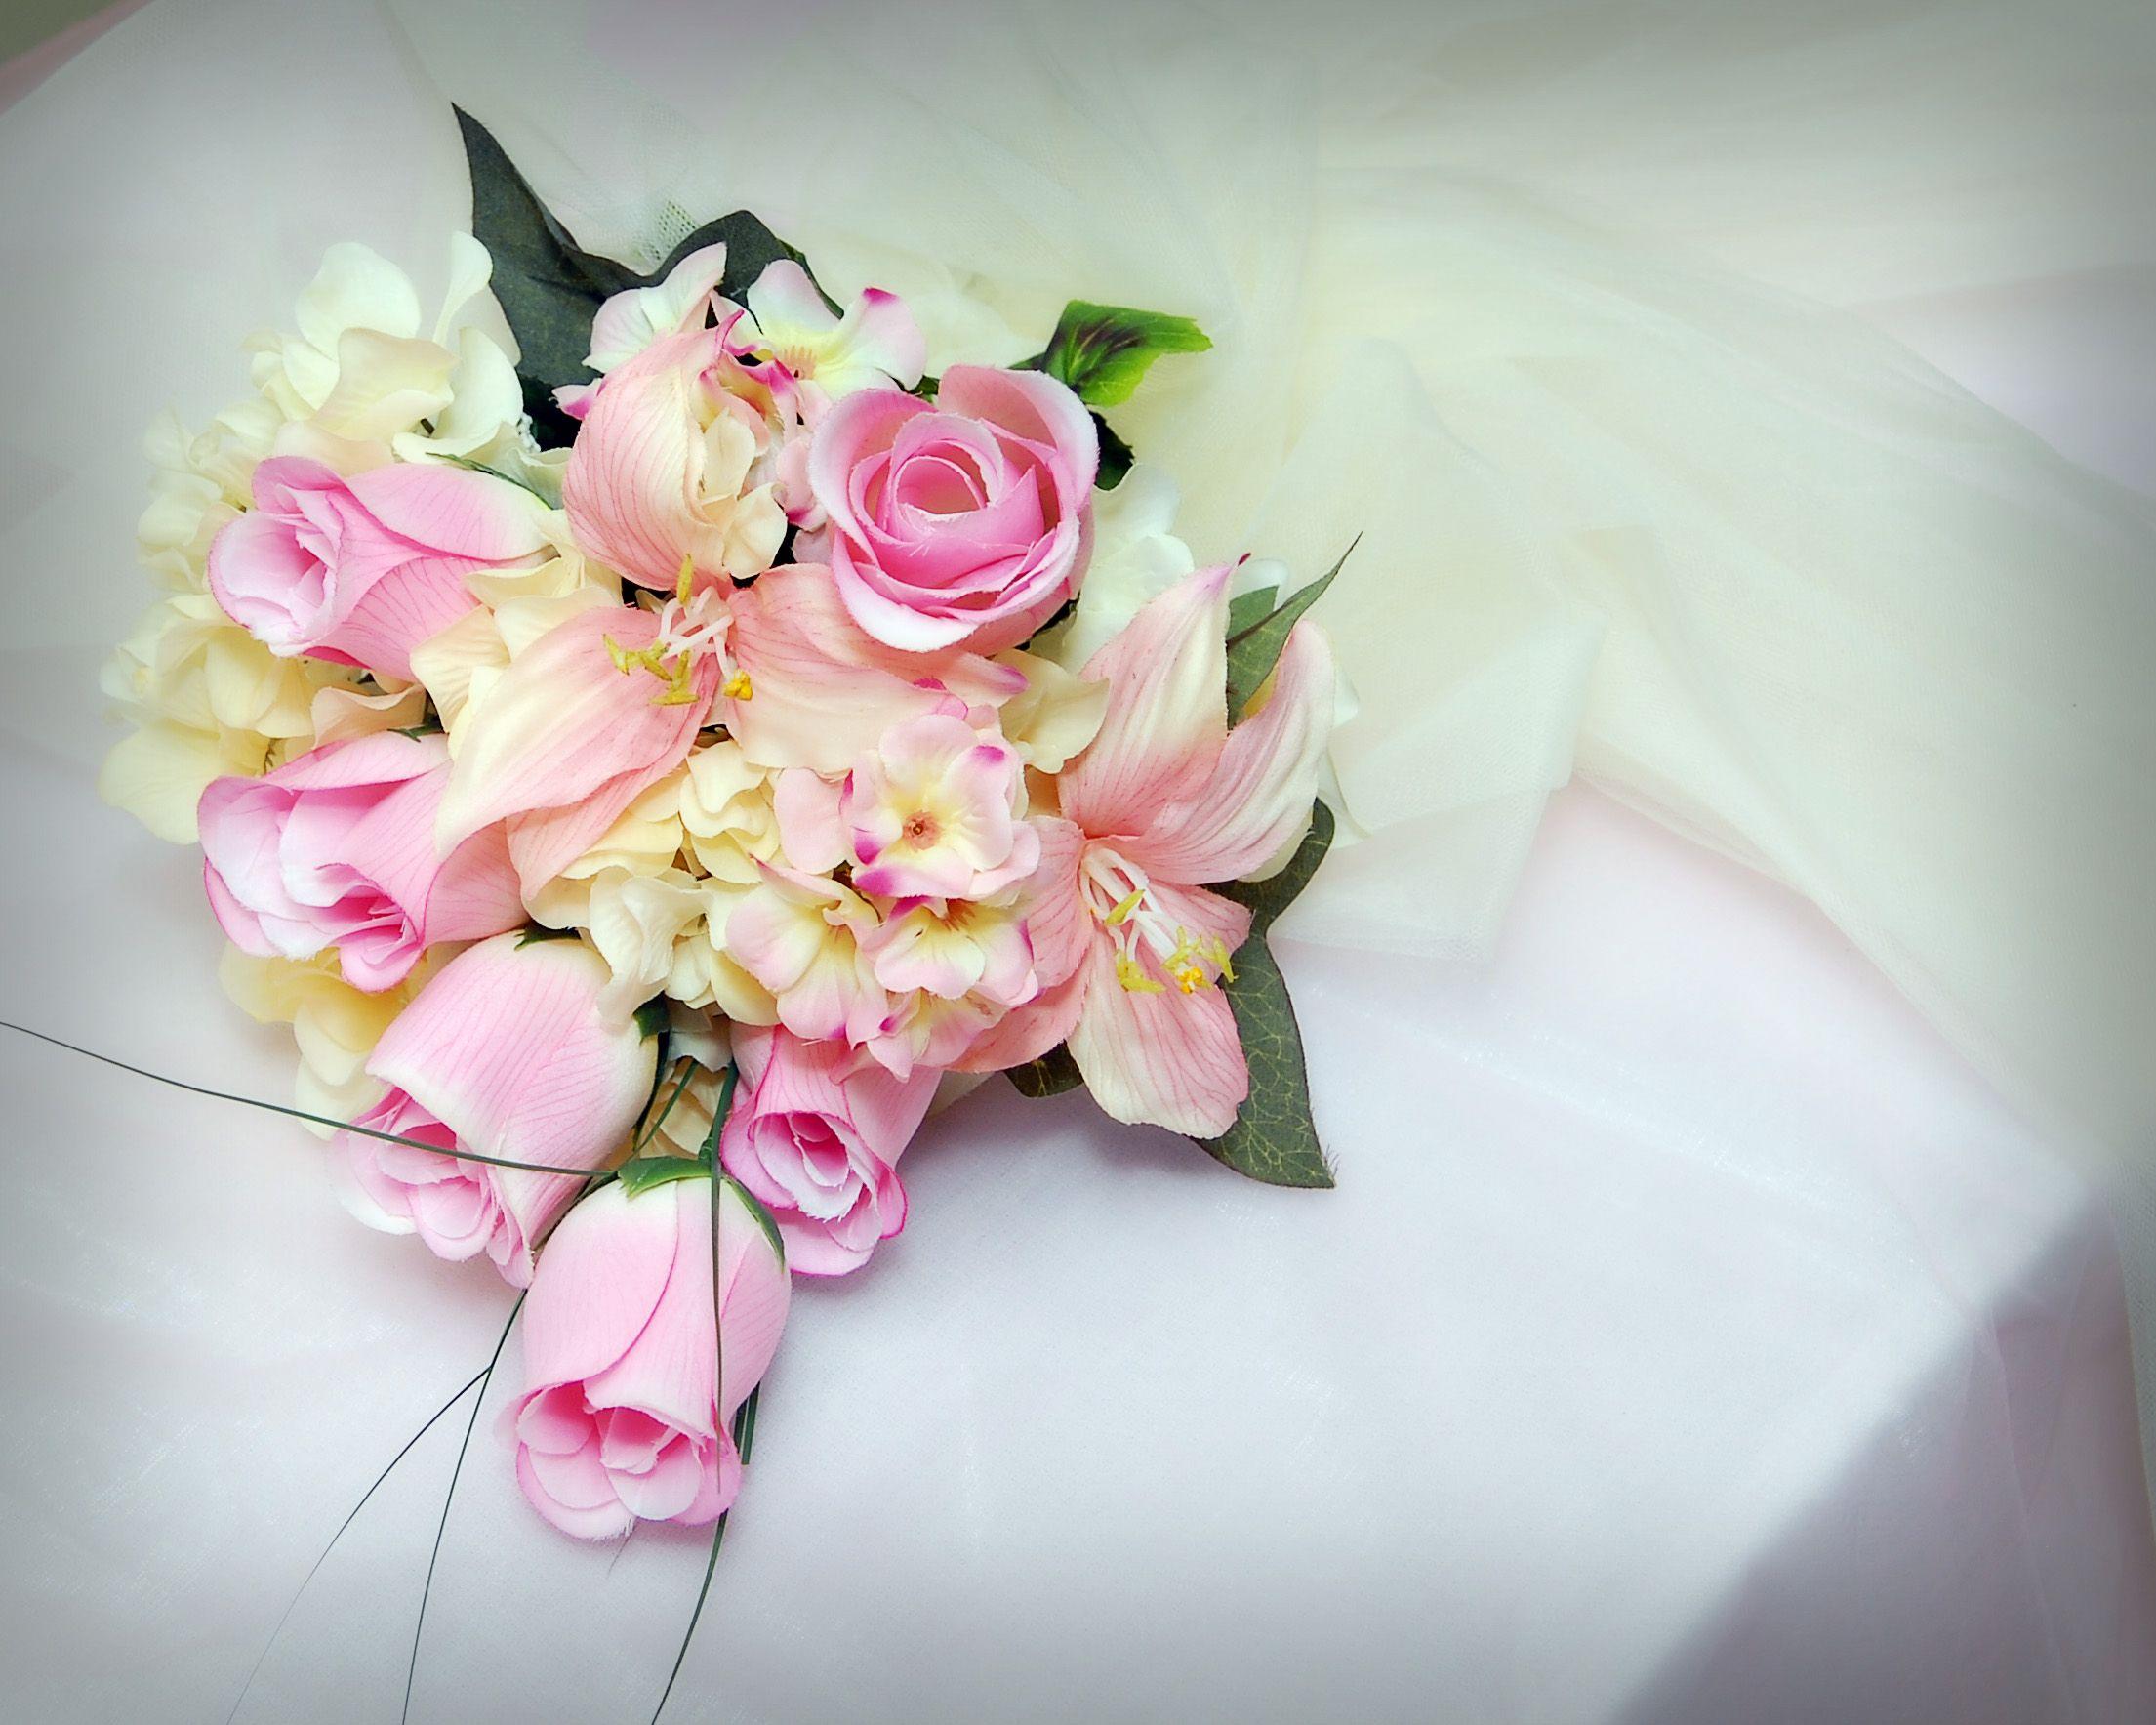 #beautiful #bouquet #custom #pink #white #arkansas #southern #weddings